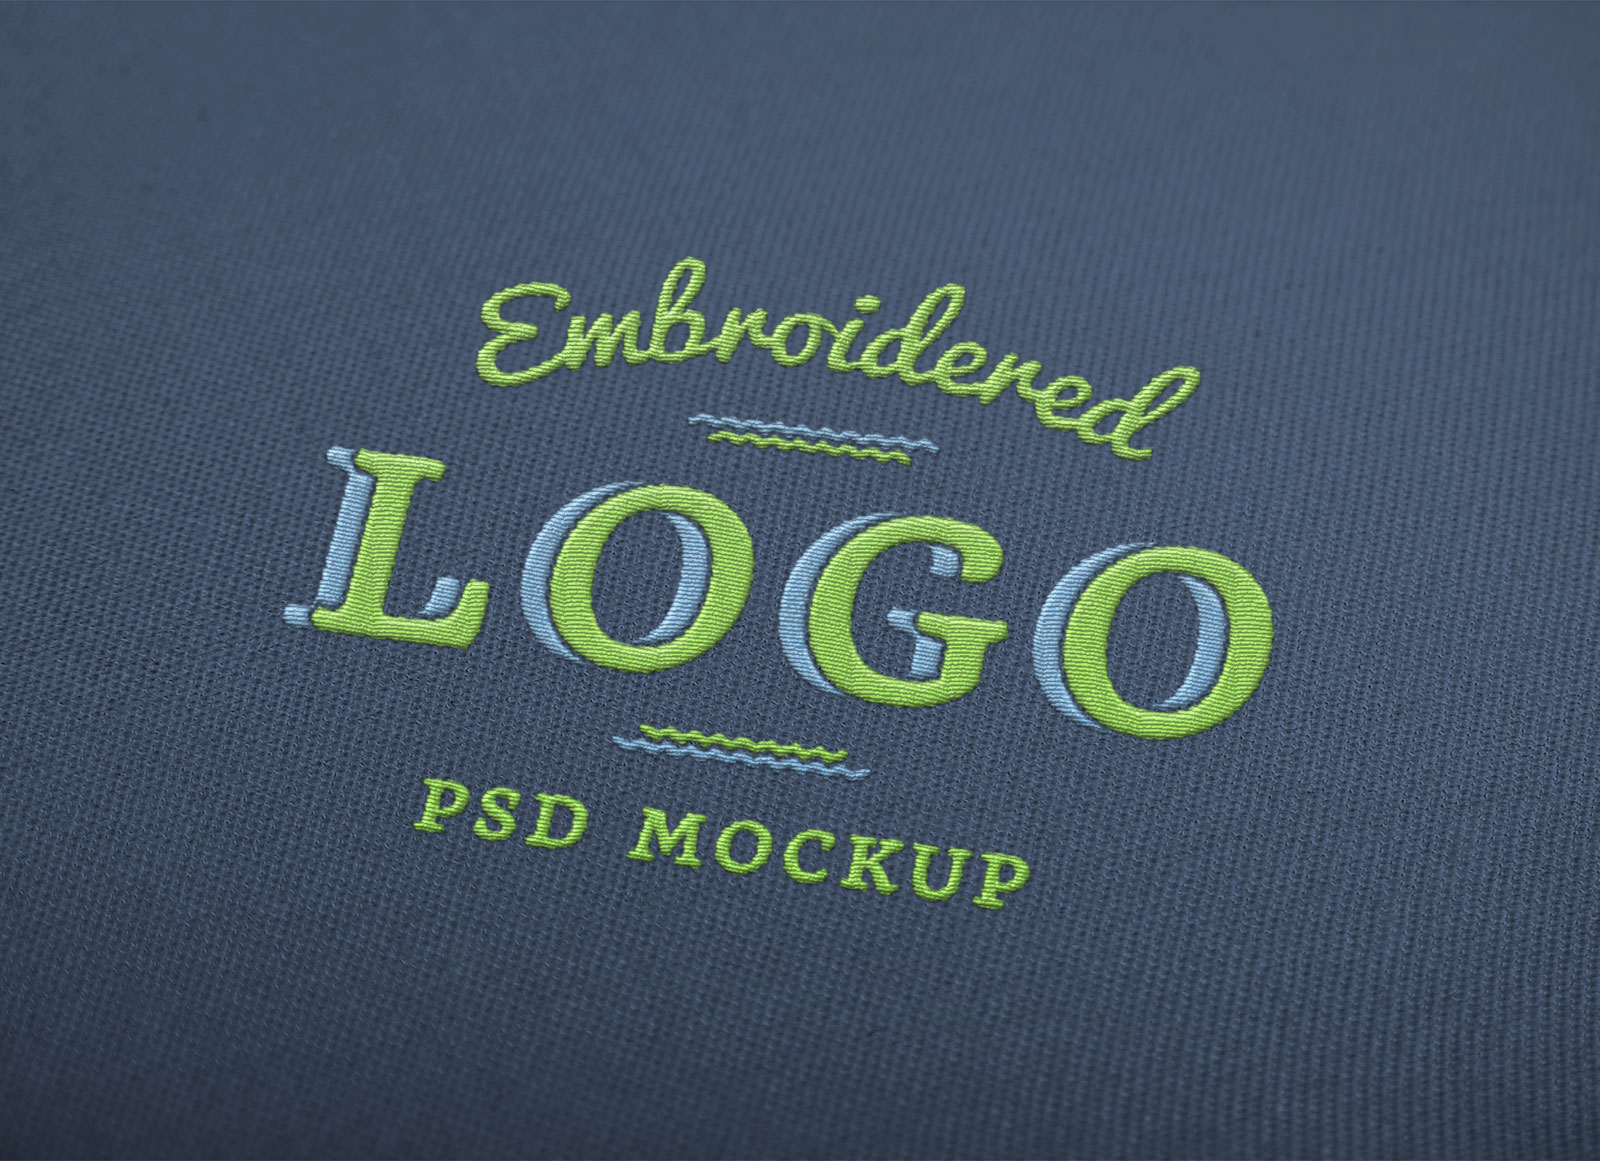 Free-Fabric-Embroidered-Logo-Mockup-PSD